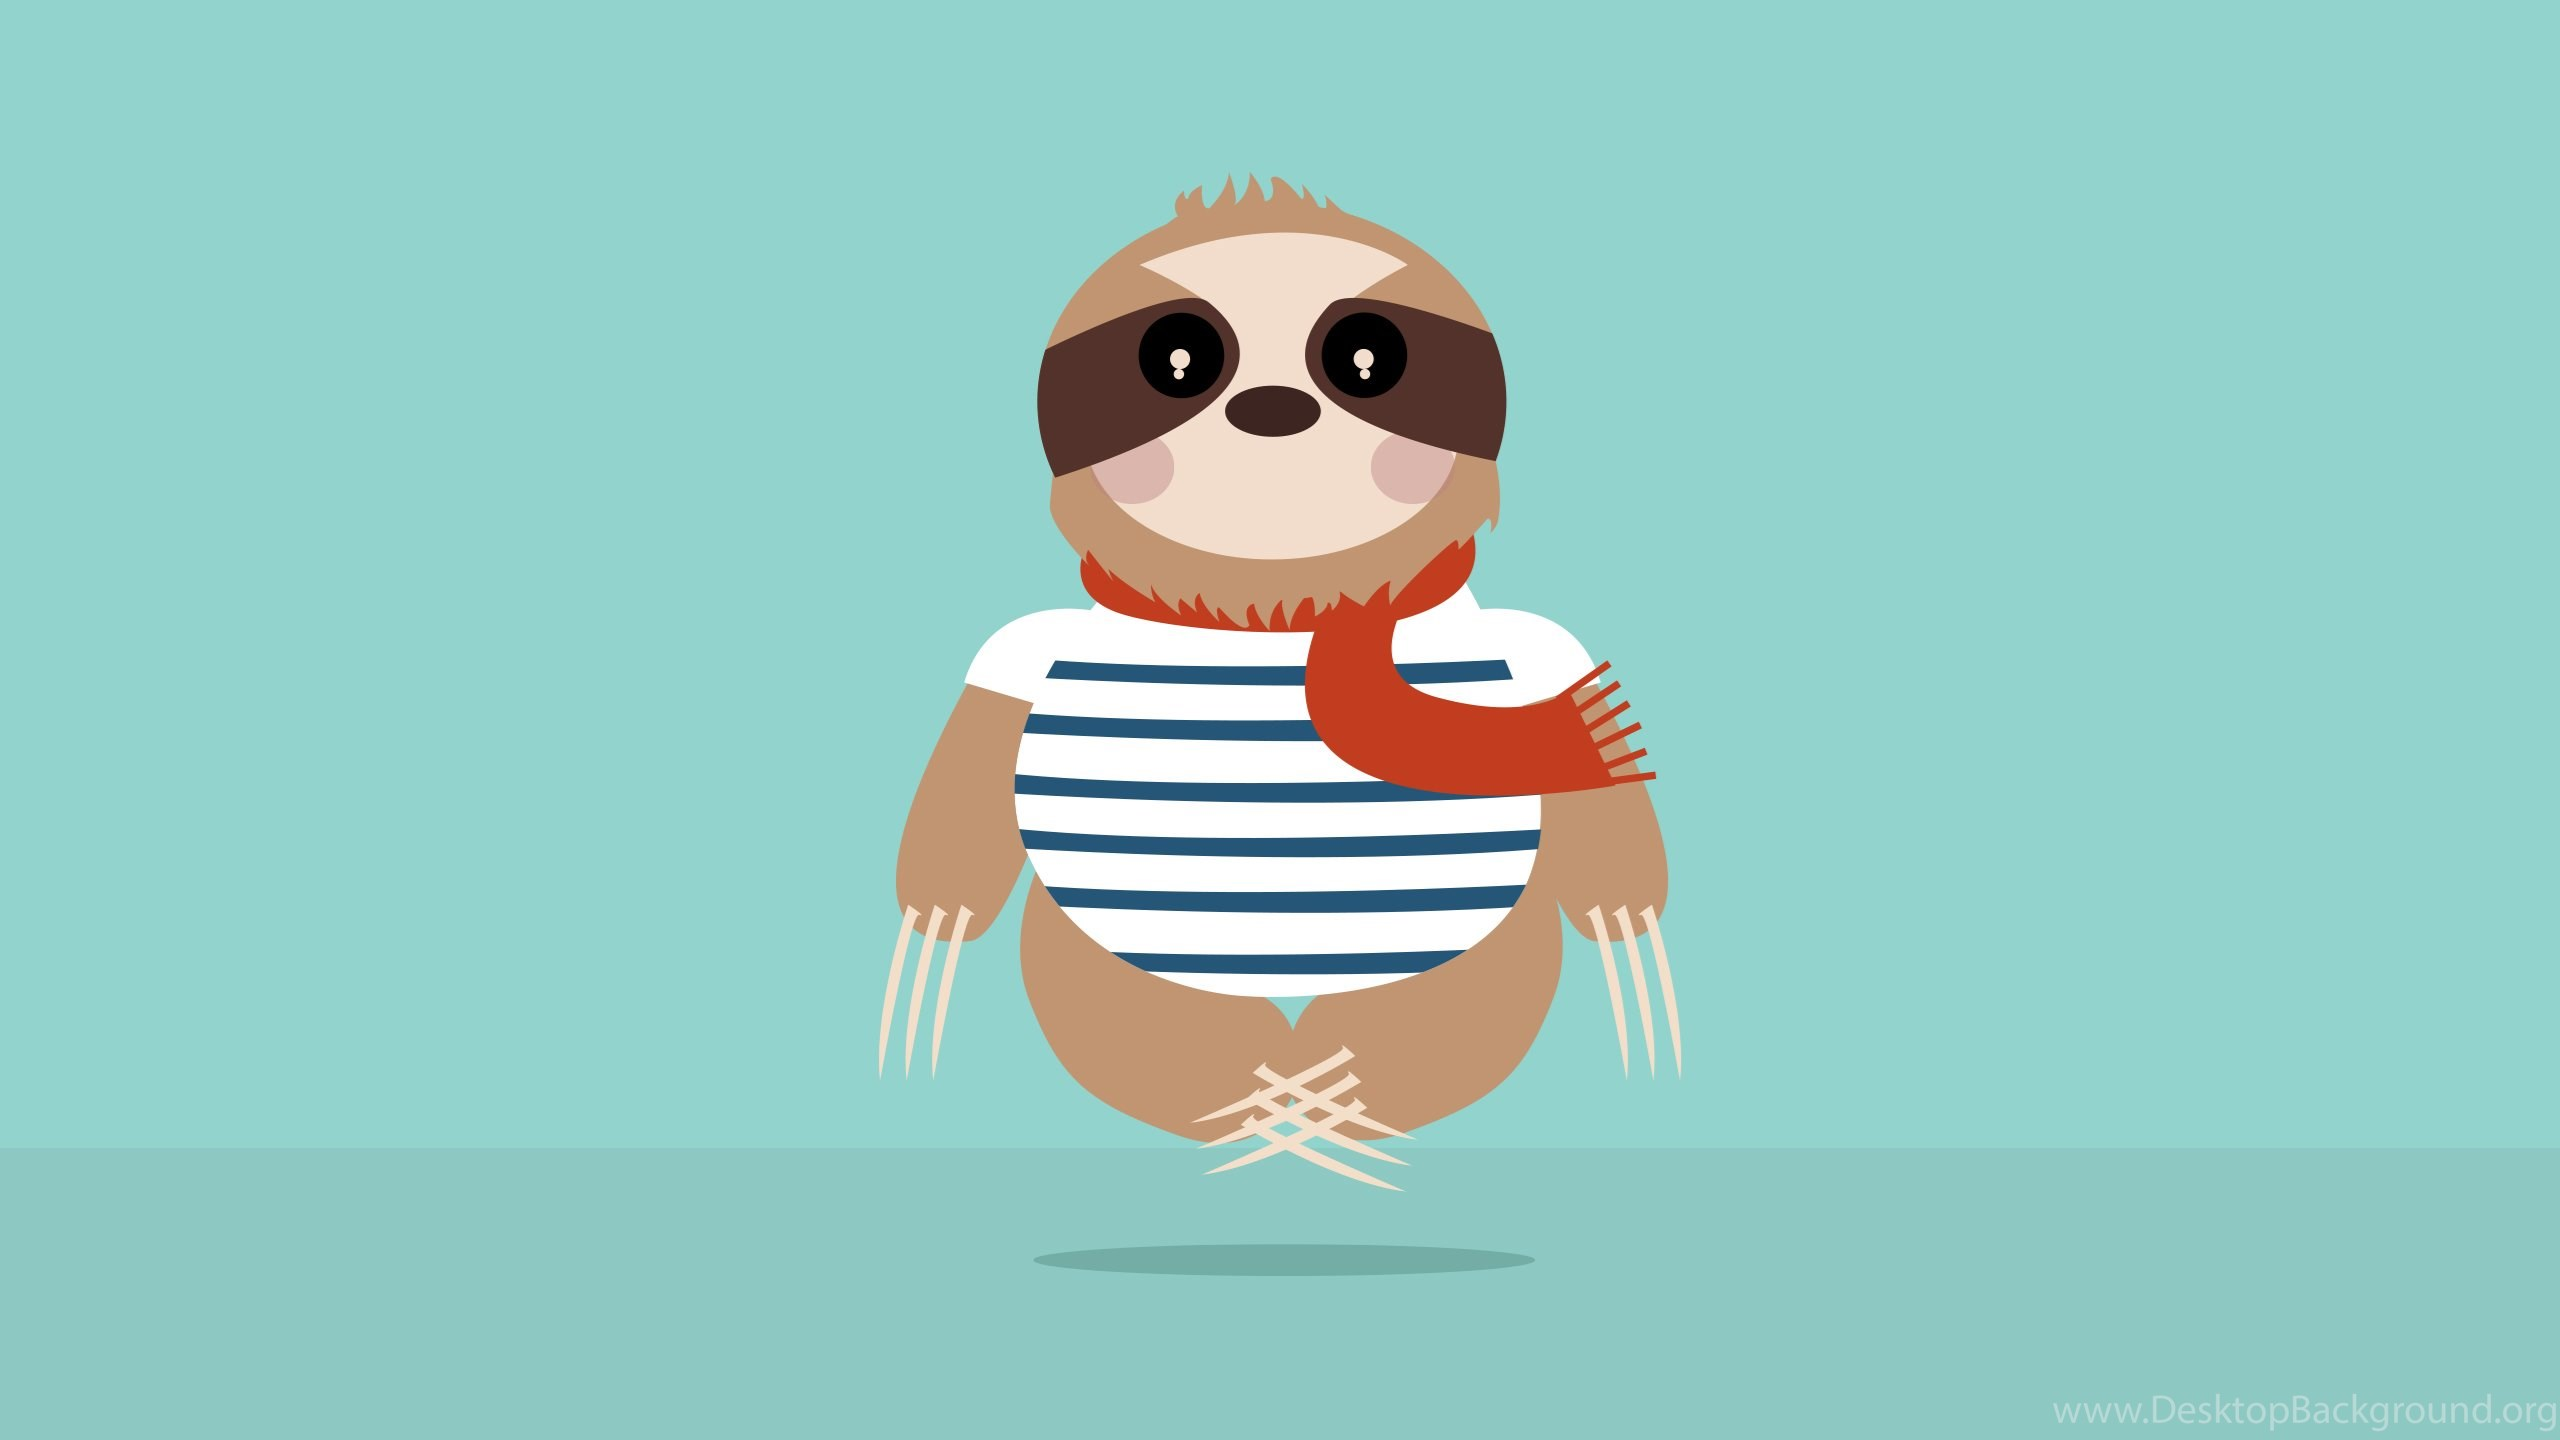 Freebies Vol 8 Sloth Wallpapers Charlene Henry Desktop Background